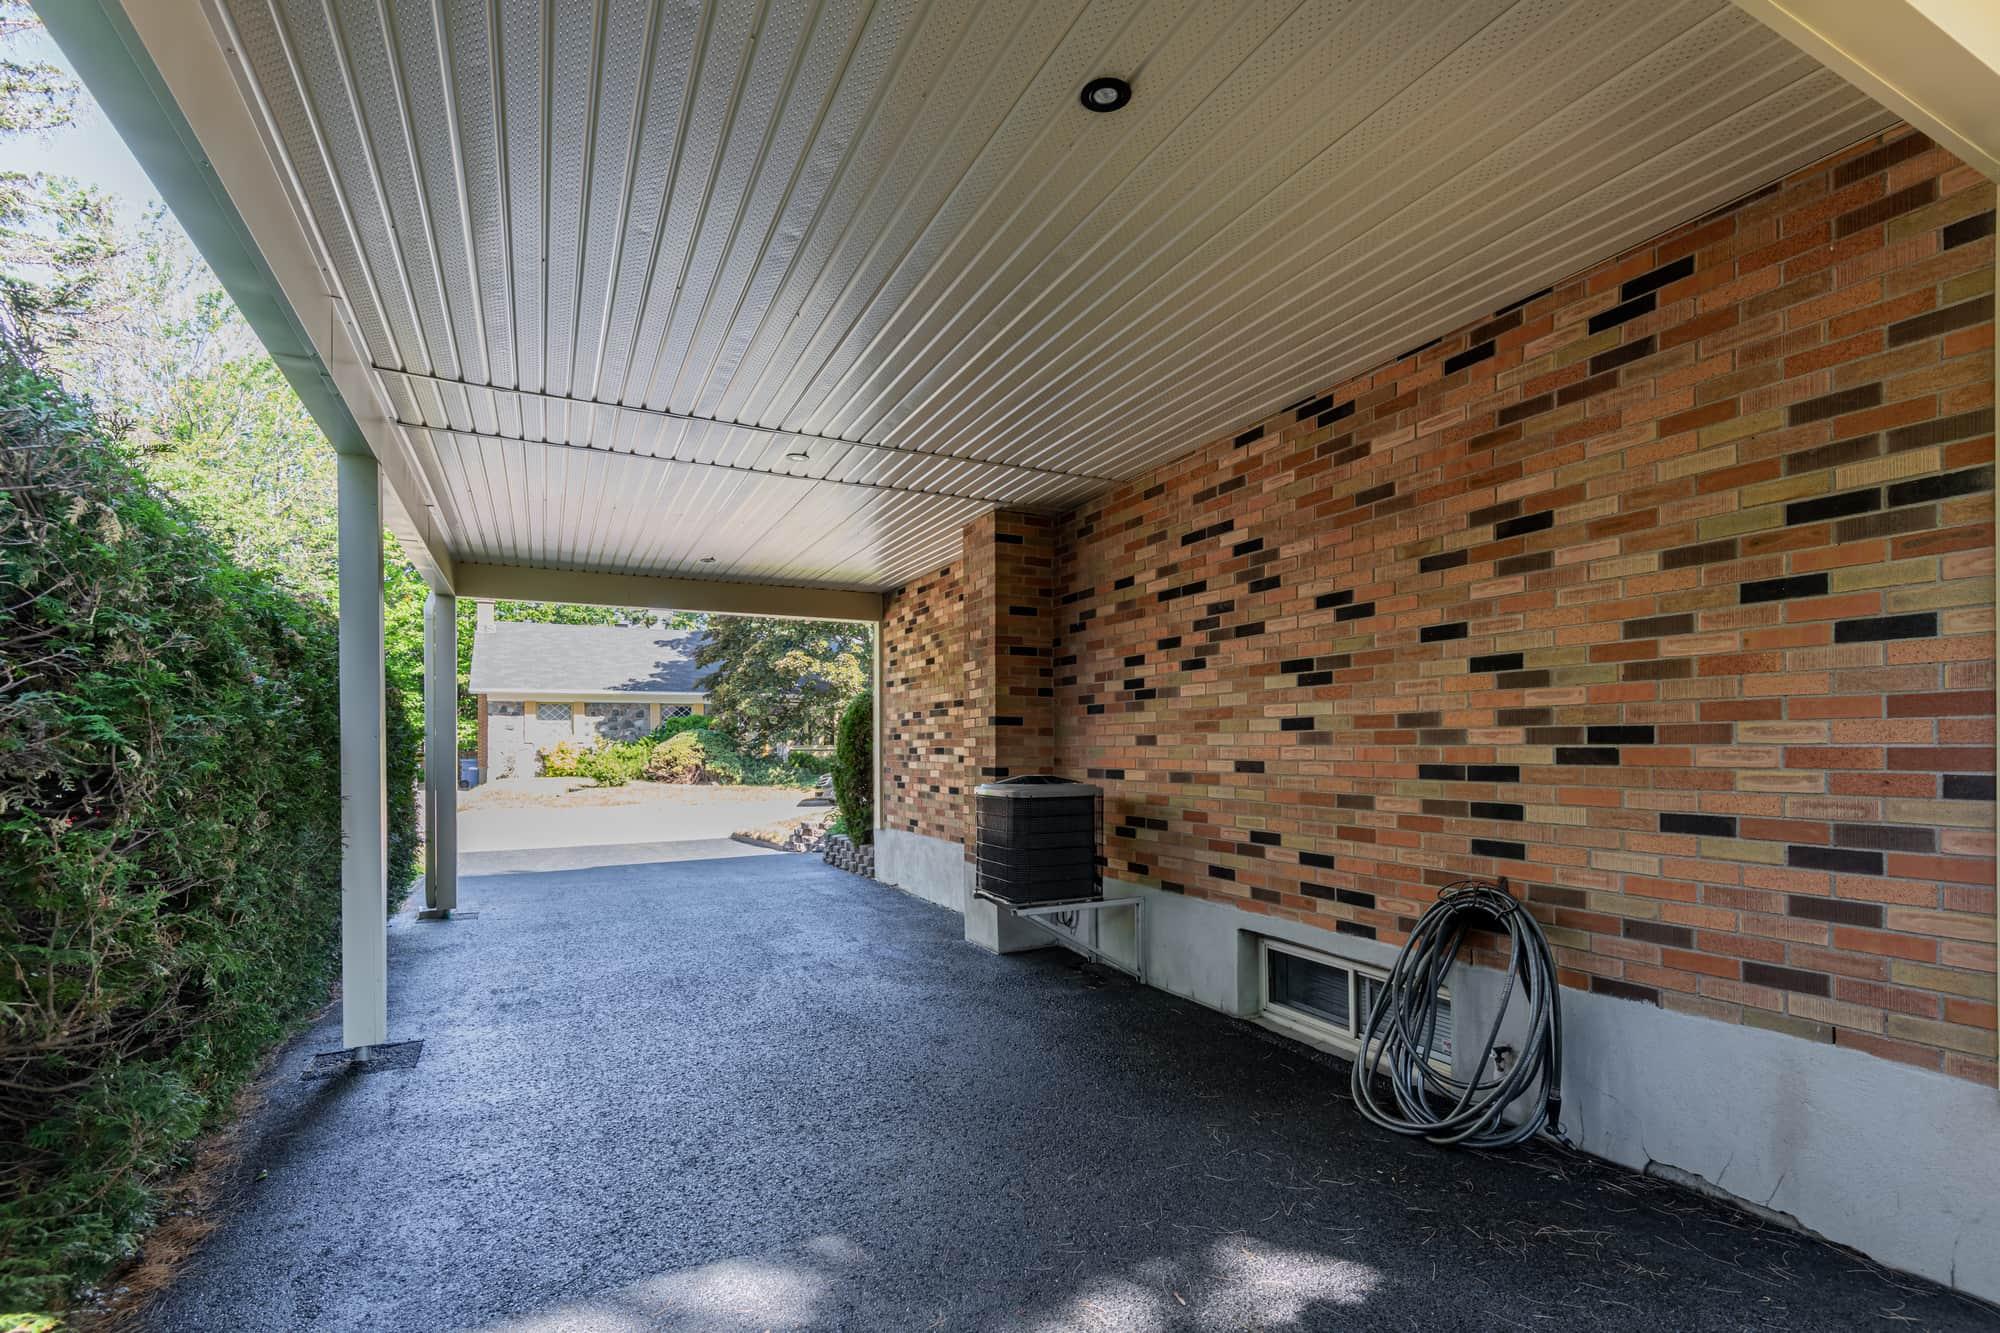 carport newly added - interior view